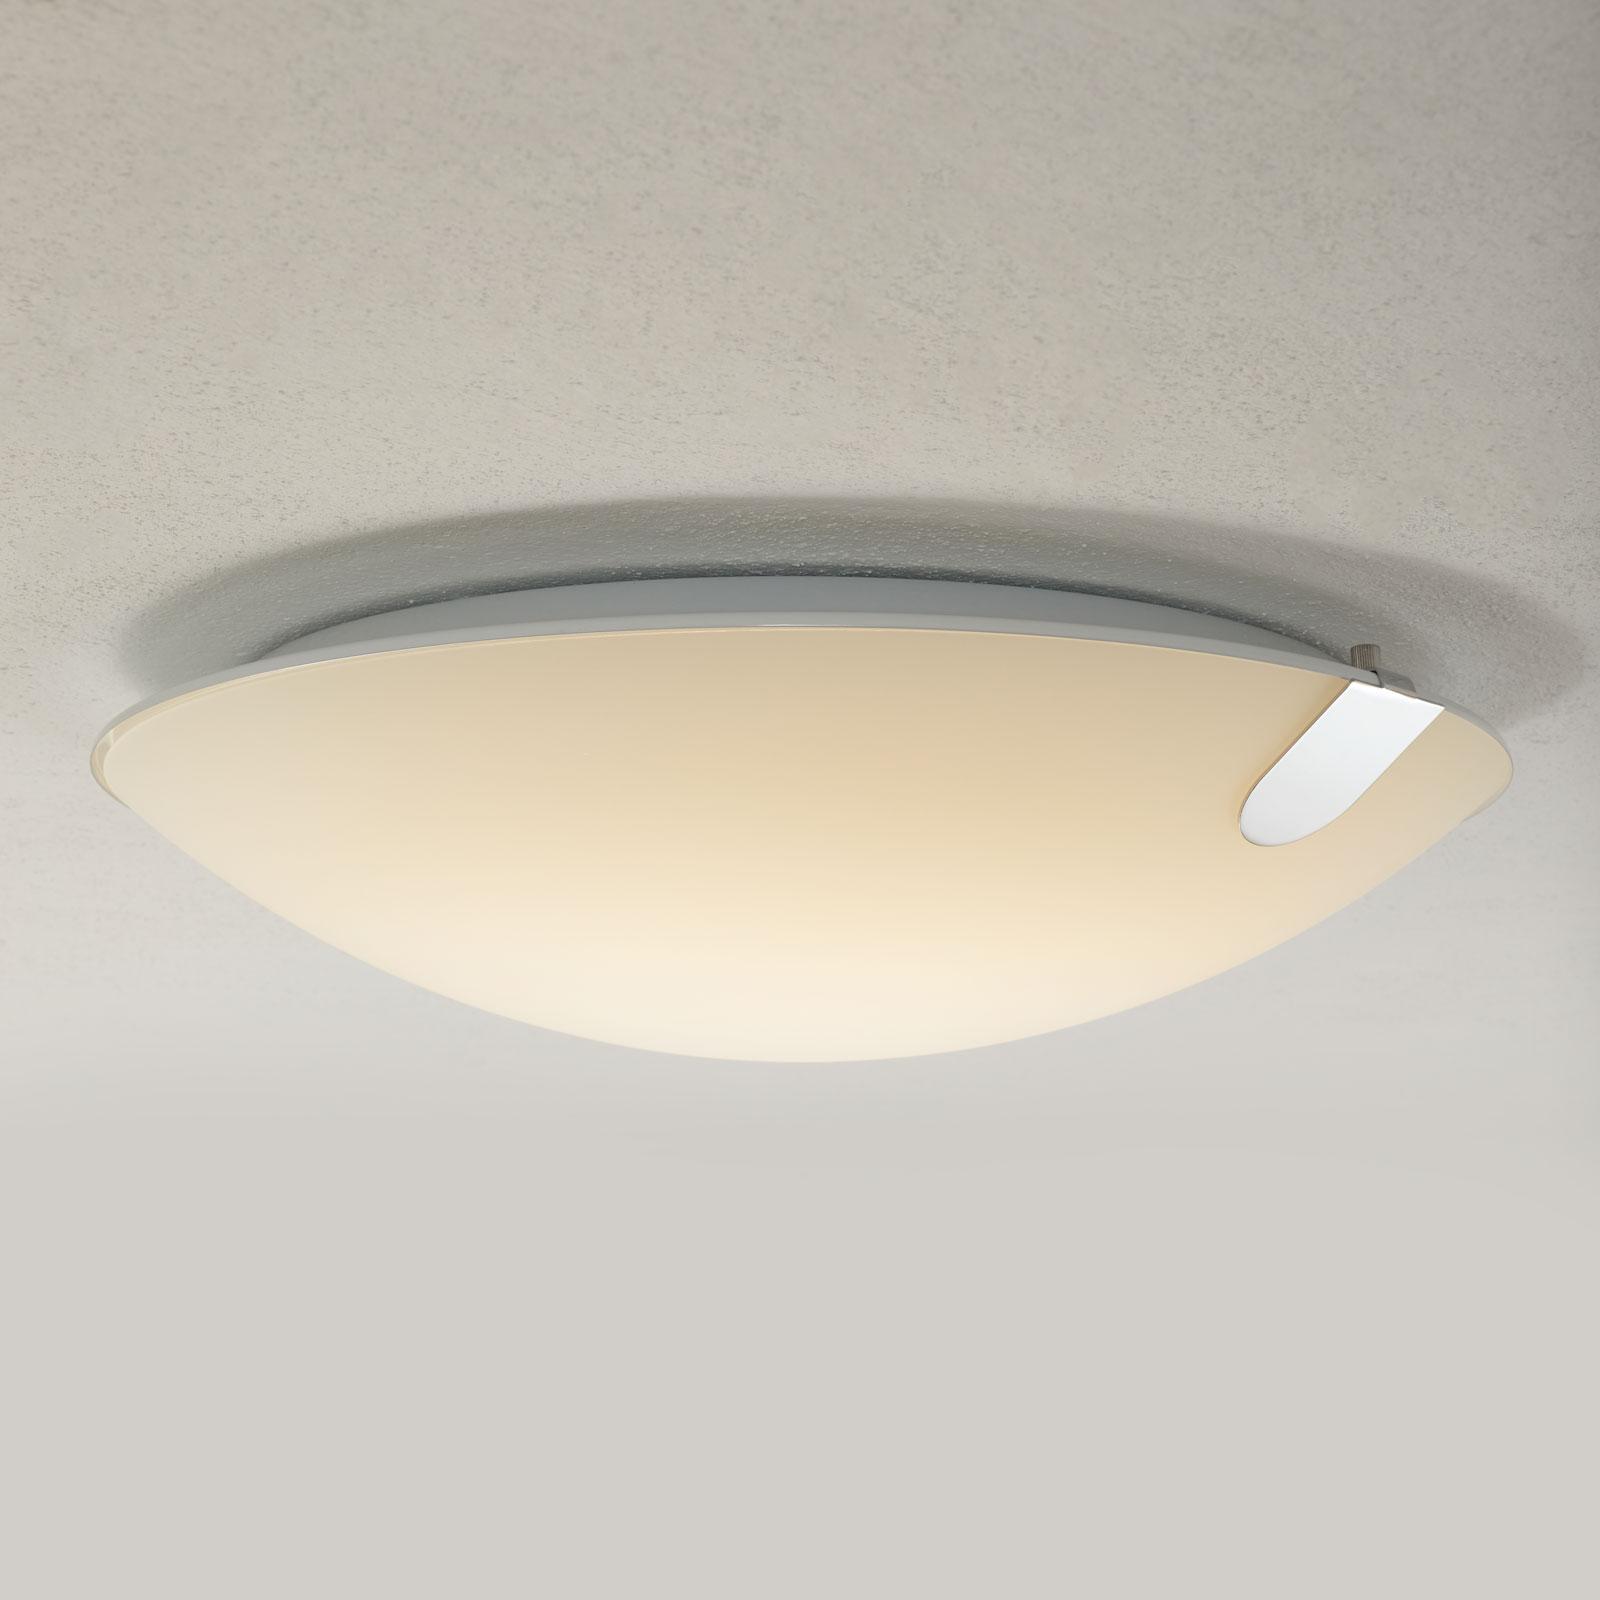 Arcchio Telie lampa sufitowa LED Ø 50 cm